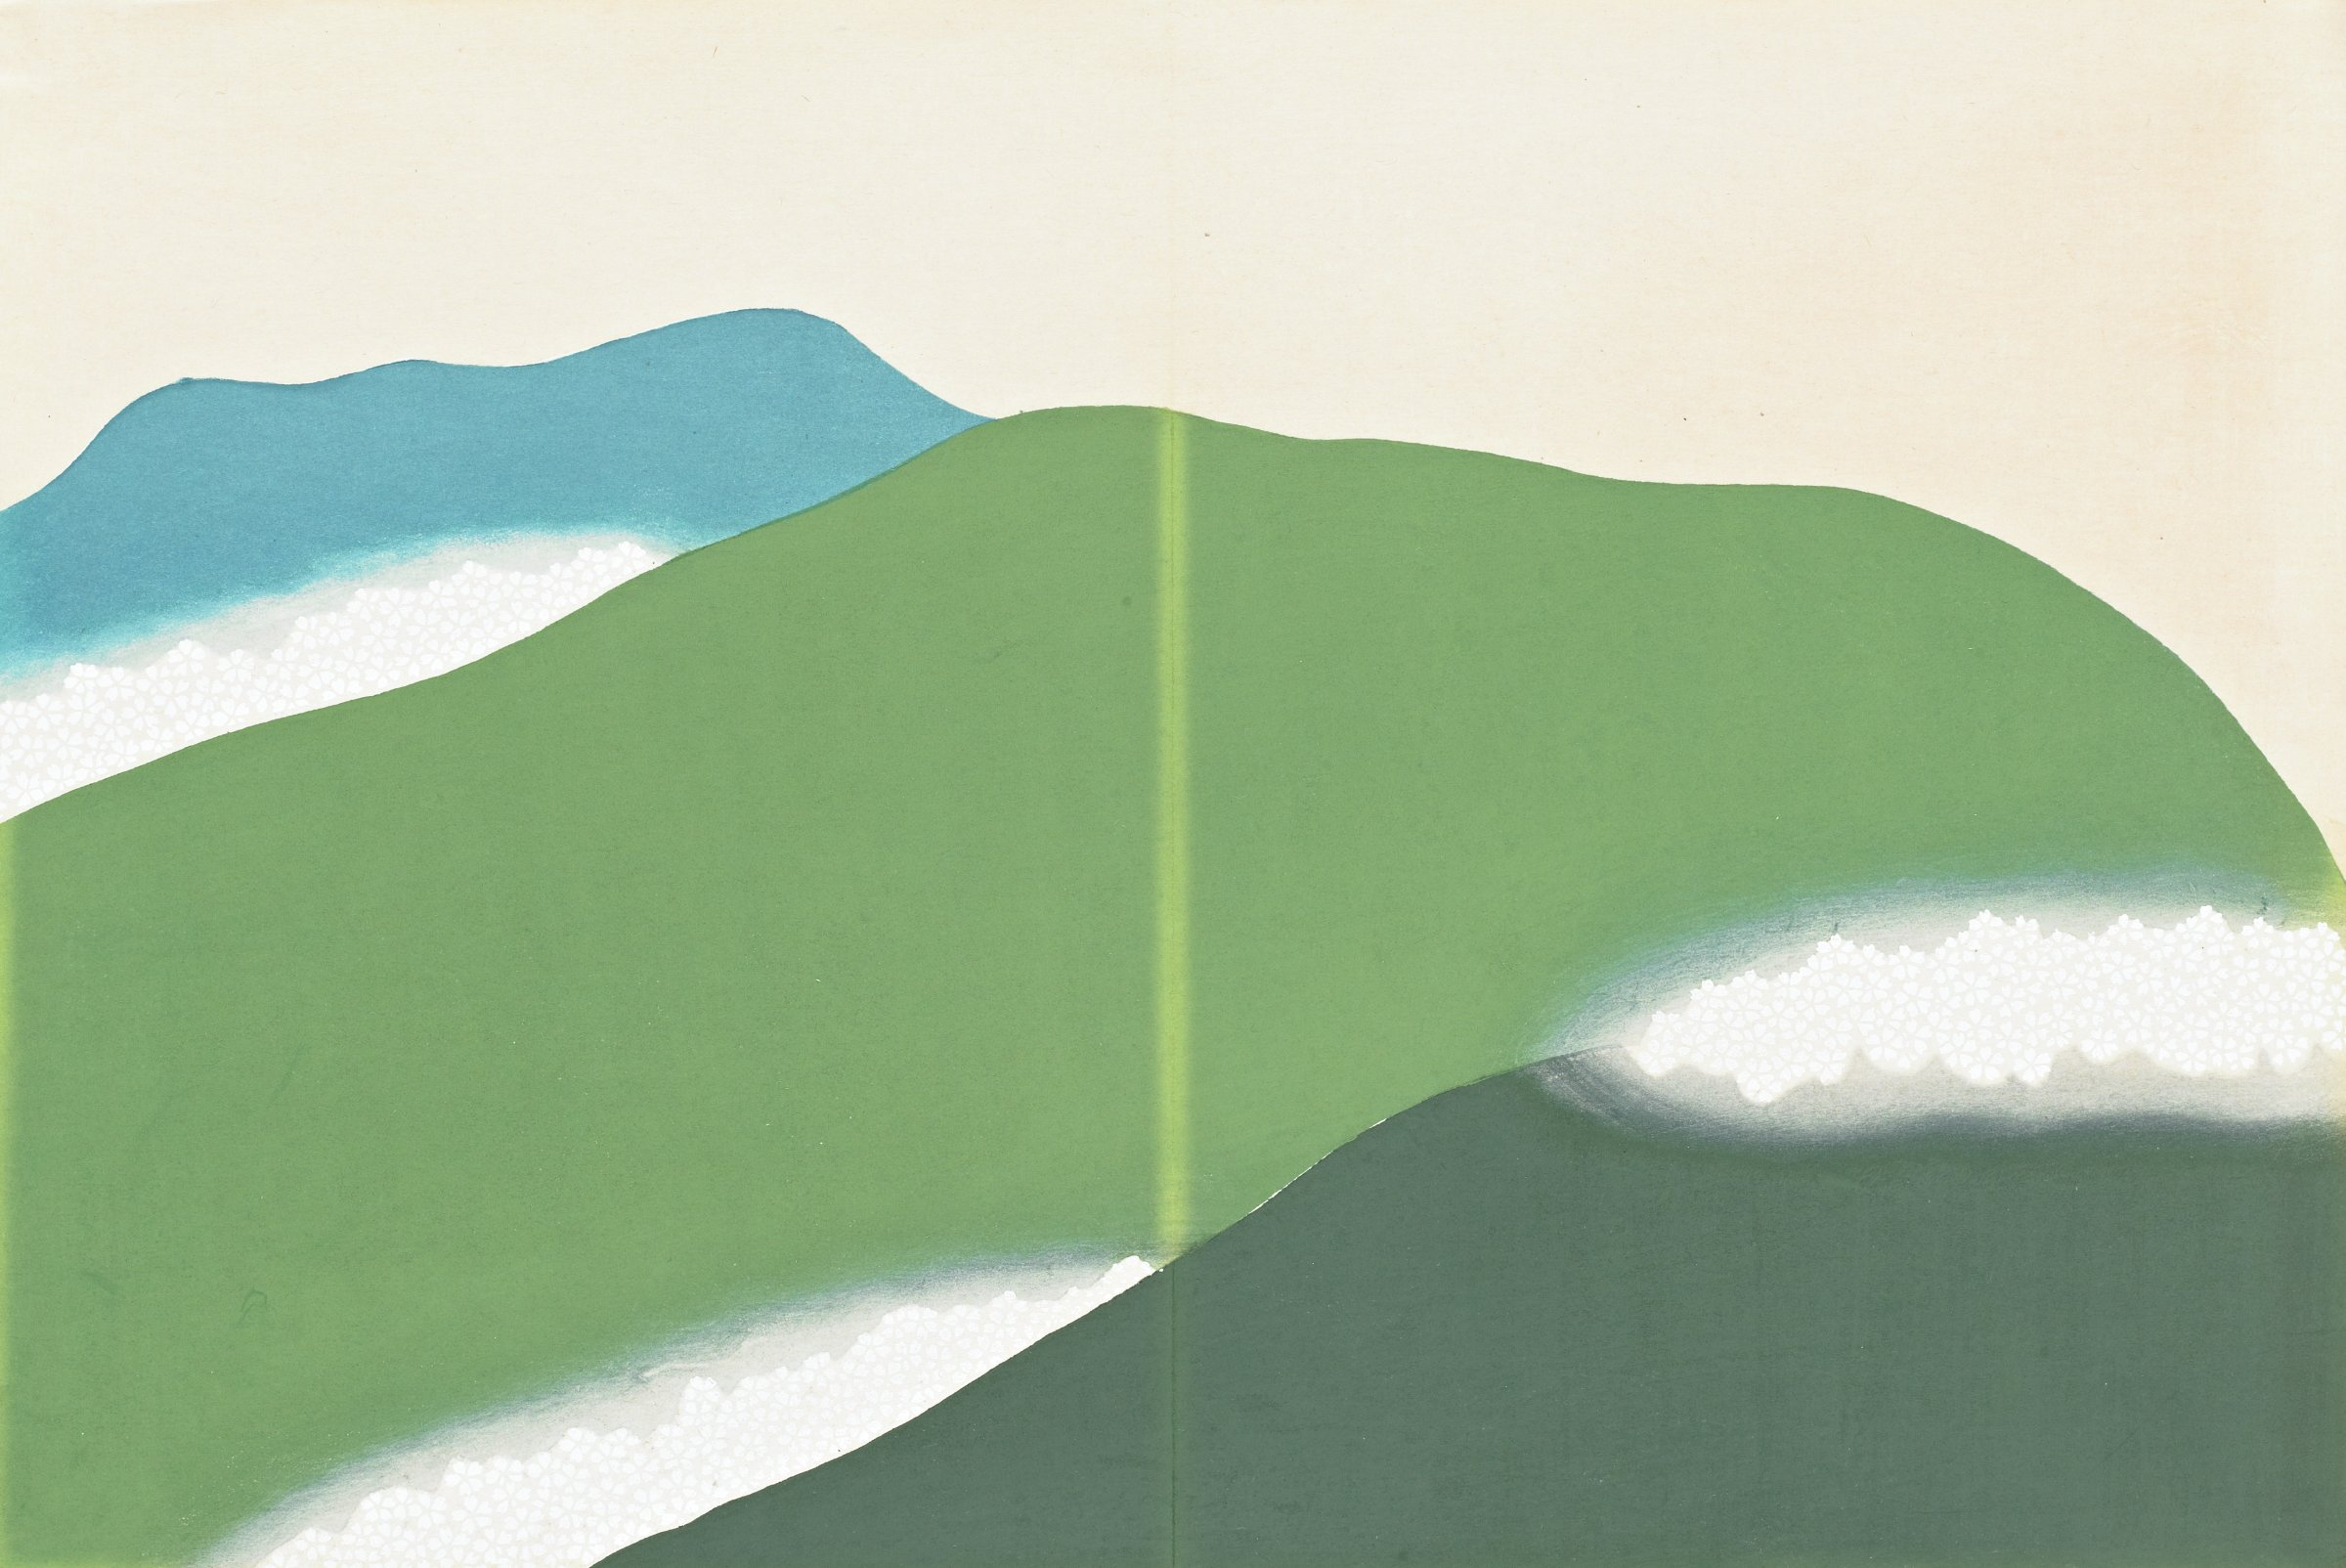 Yoshino, from Momoyogusa (A World of Things), Volume 3, Kamisaka Sekka, ink and color on paper